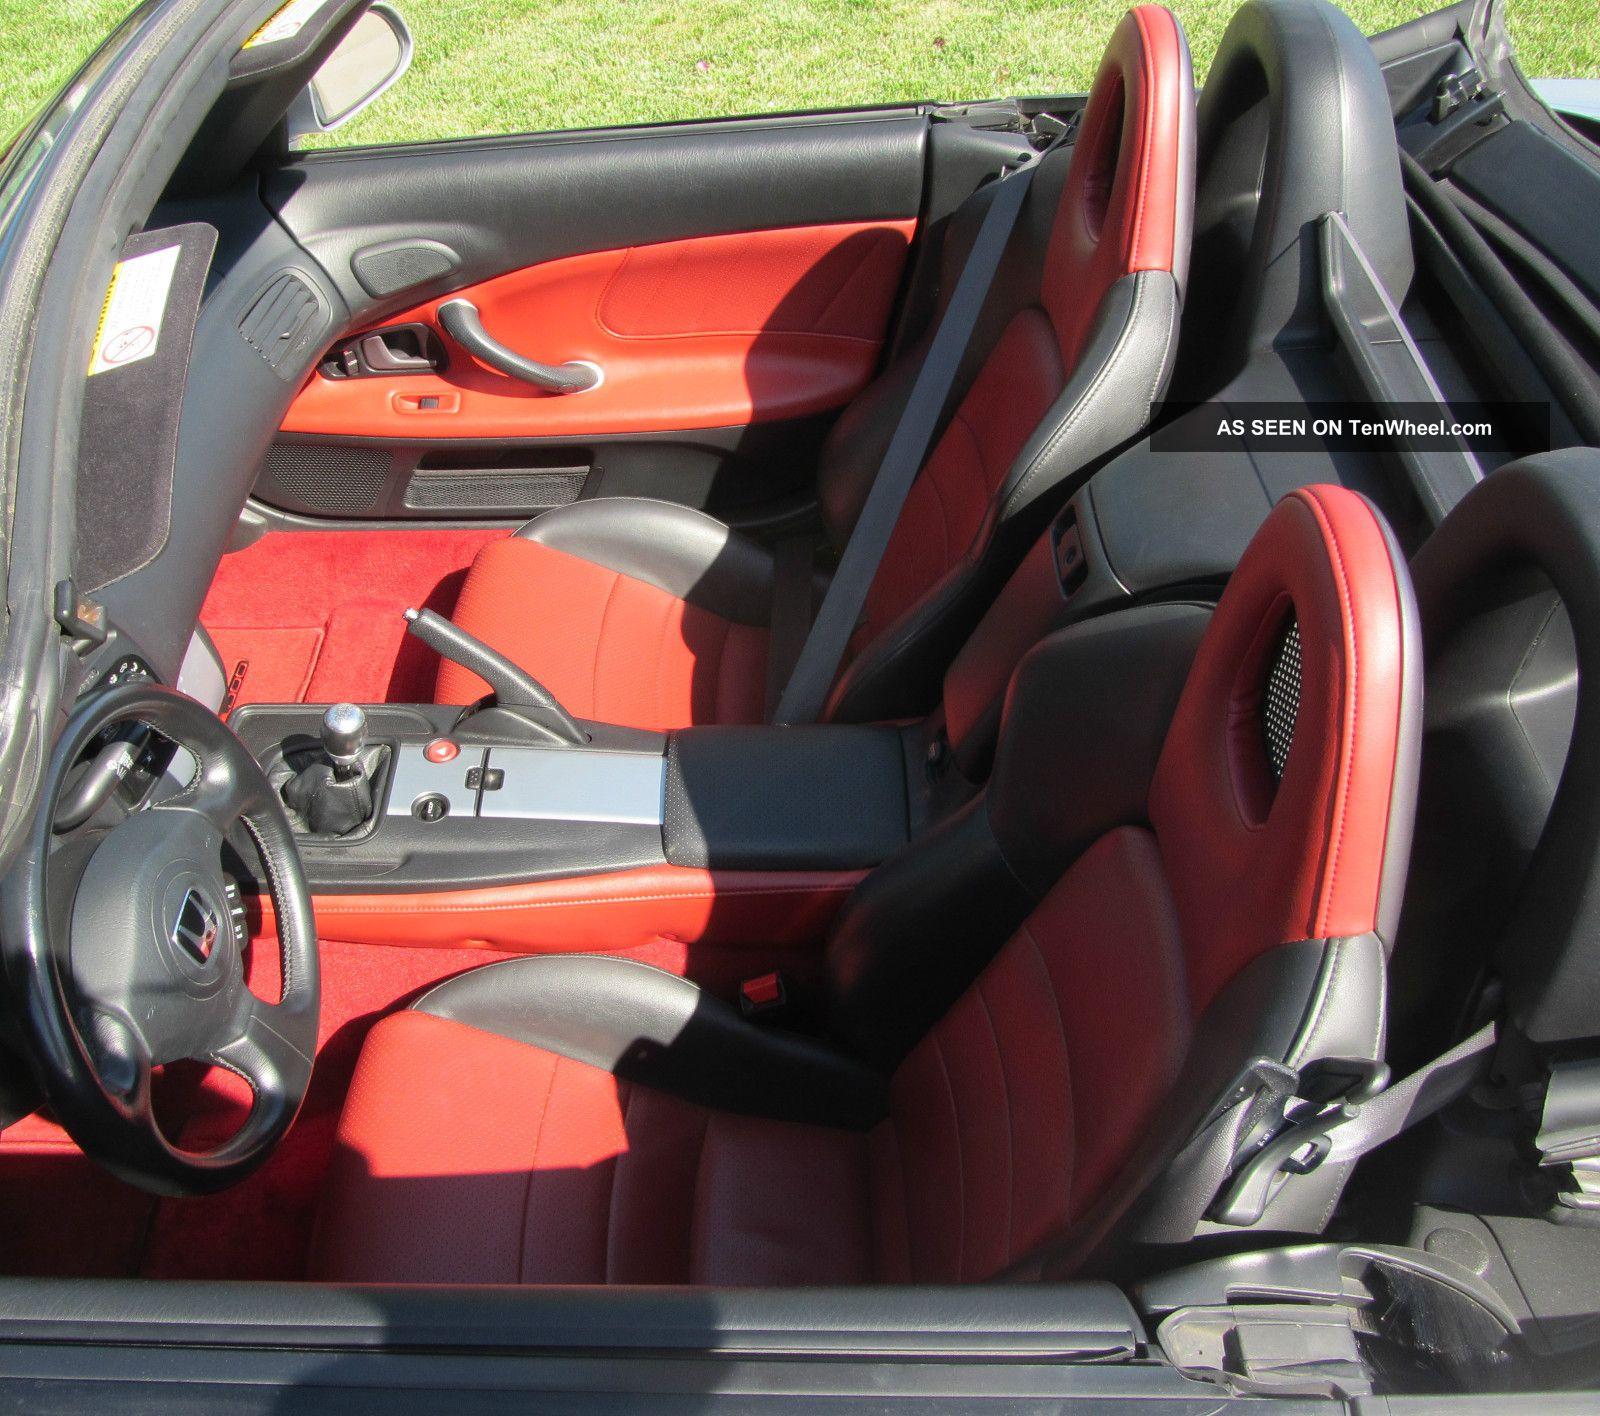 2005 Honda S2000, 6 Speed, 59k Mi. , Silver, Limited Red